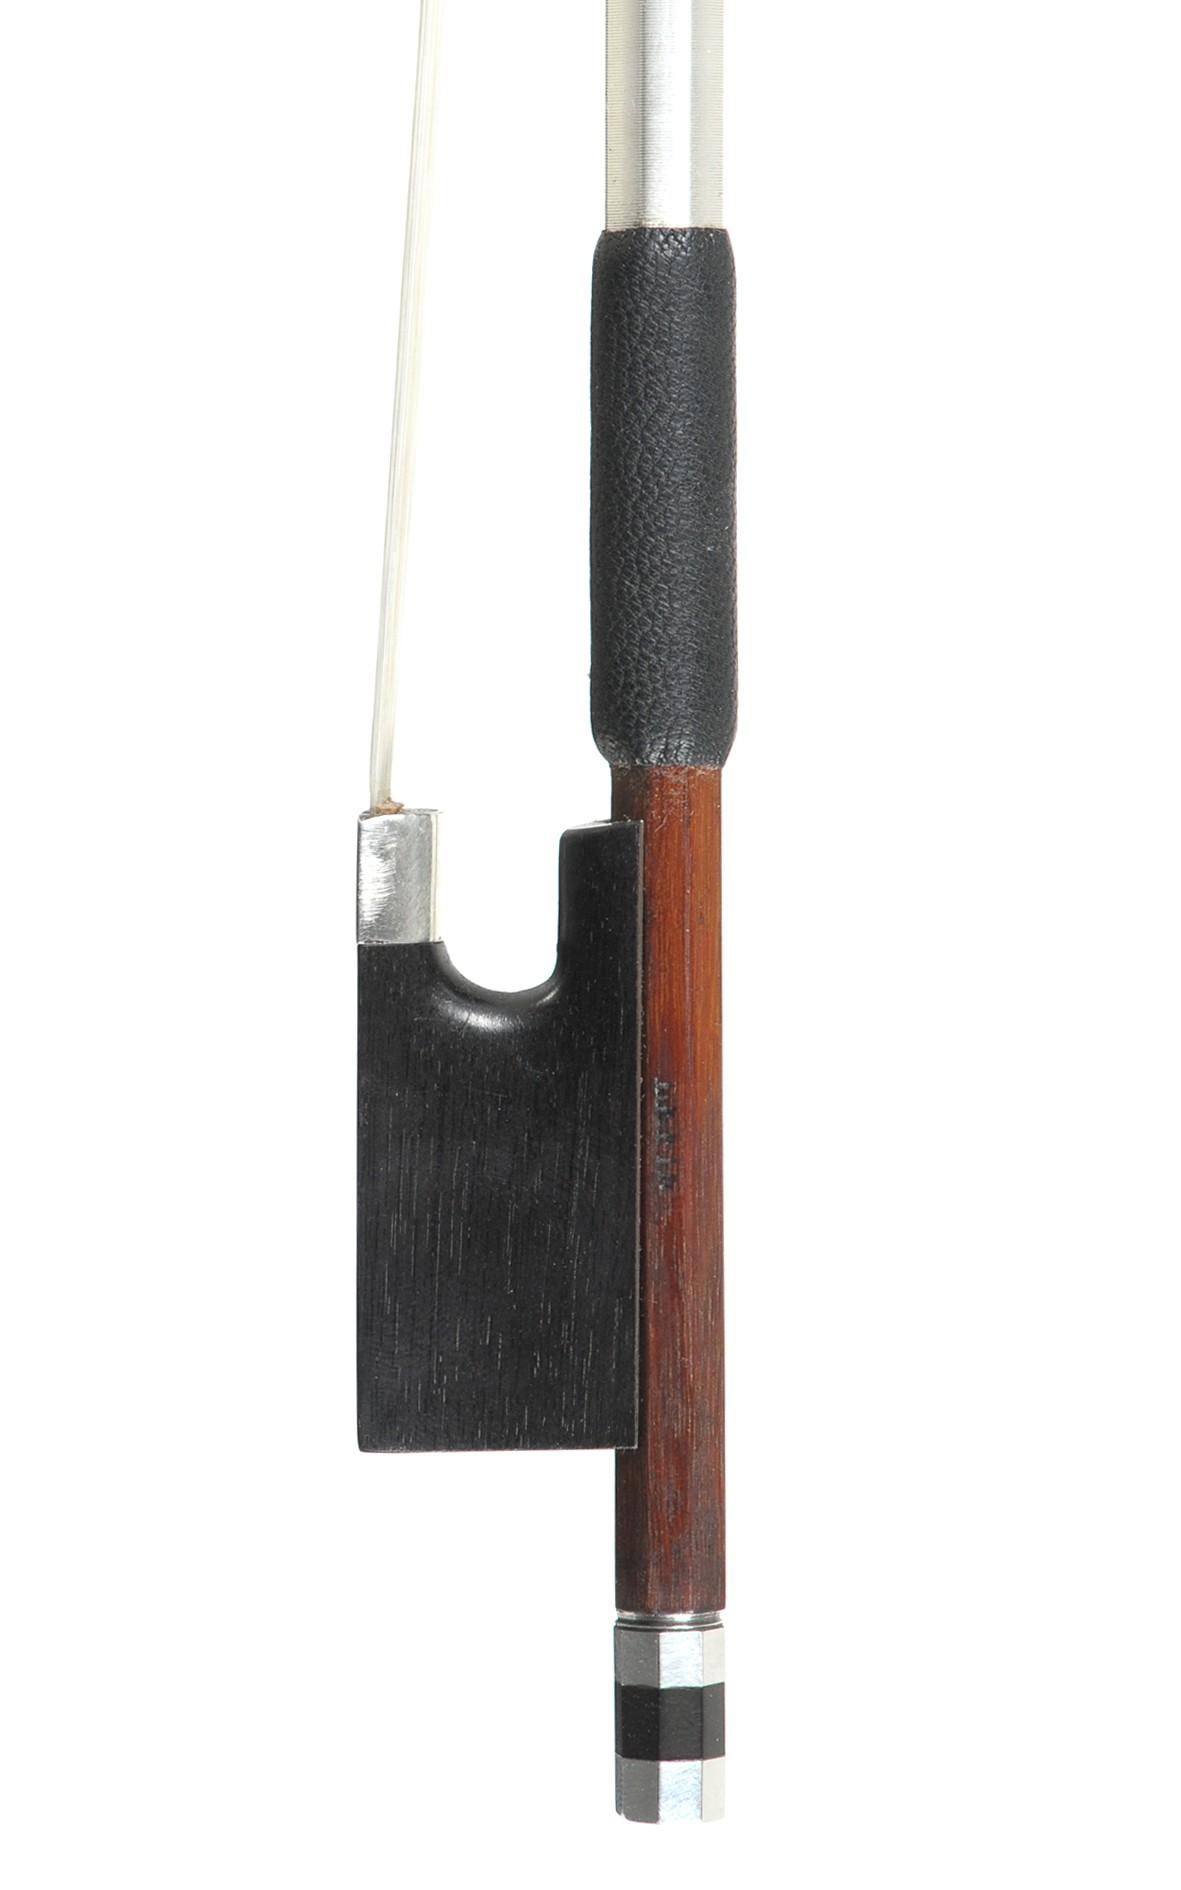 Swiss violin bow, Finkel, approx. 1980 - frog